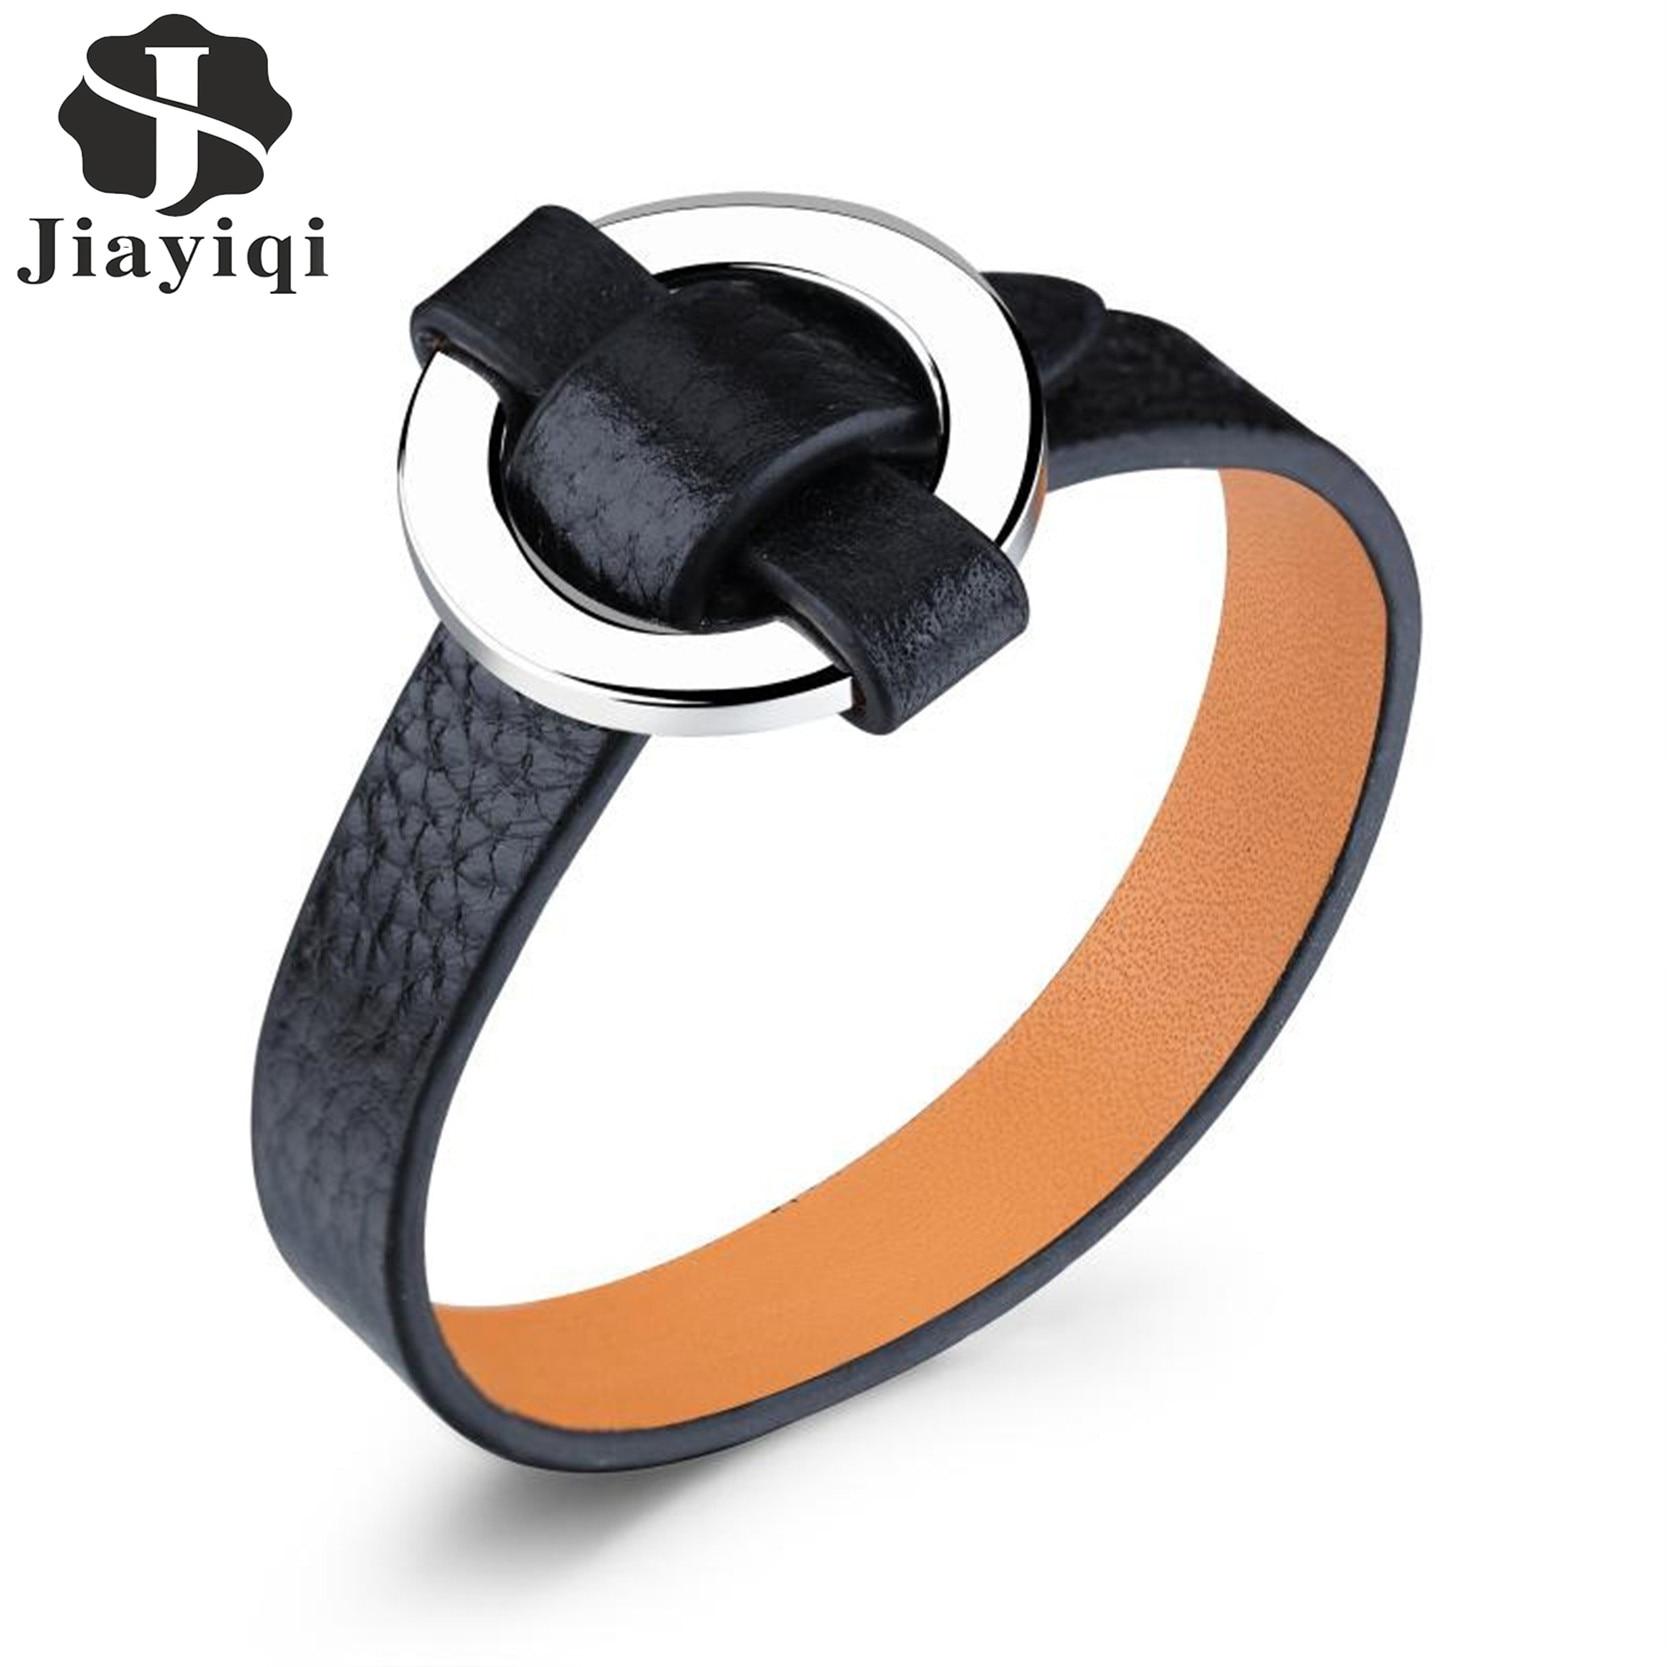 jiayiqi fashion black leather bracelet for women men round stainless steel bracelets bangles. Black Bedroom Furniture Sets. Home Design Ideas